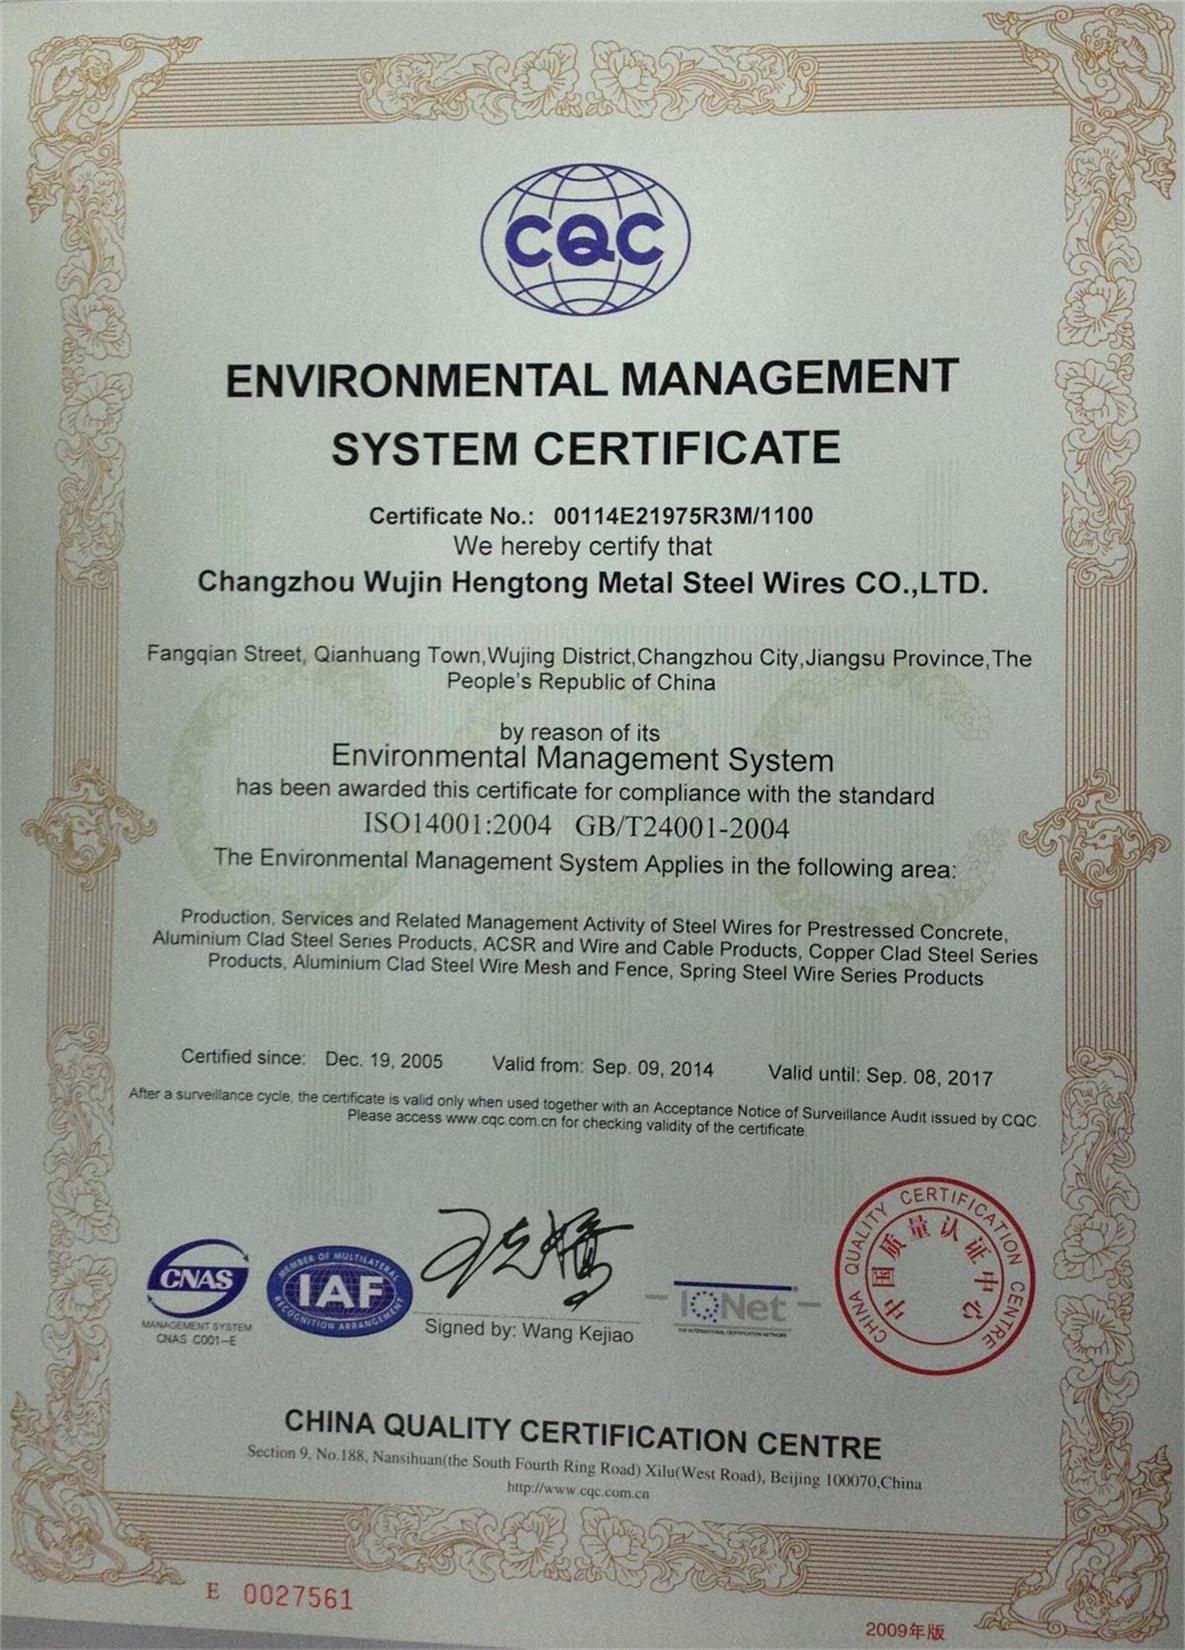 ENVIROMENT MANAGEMENT SYSTEM CERTIFICATE